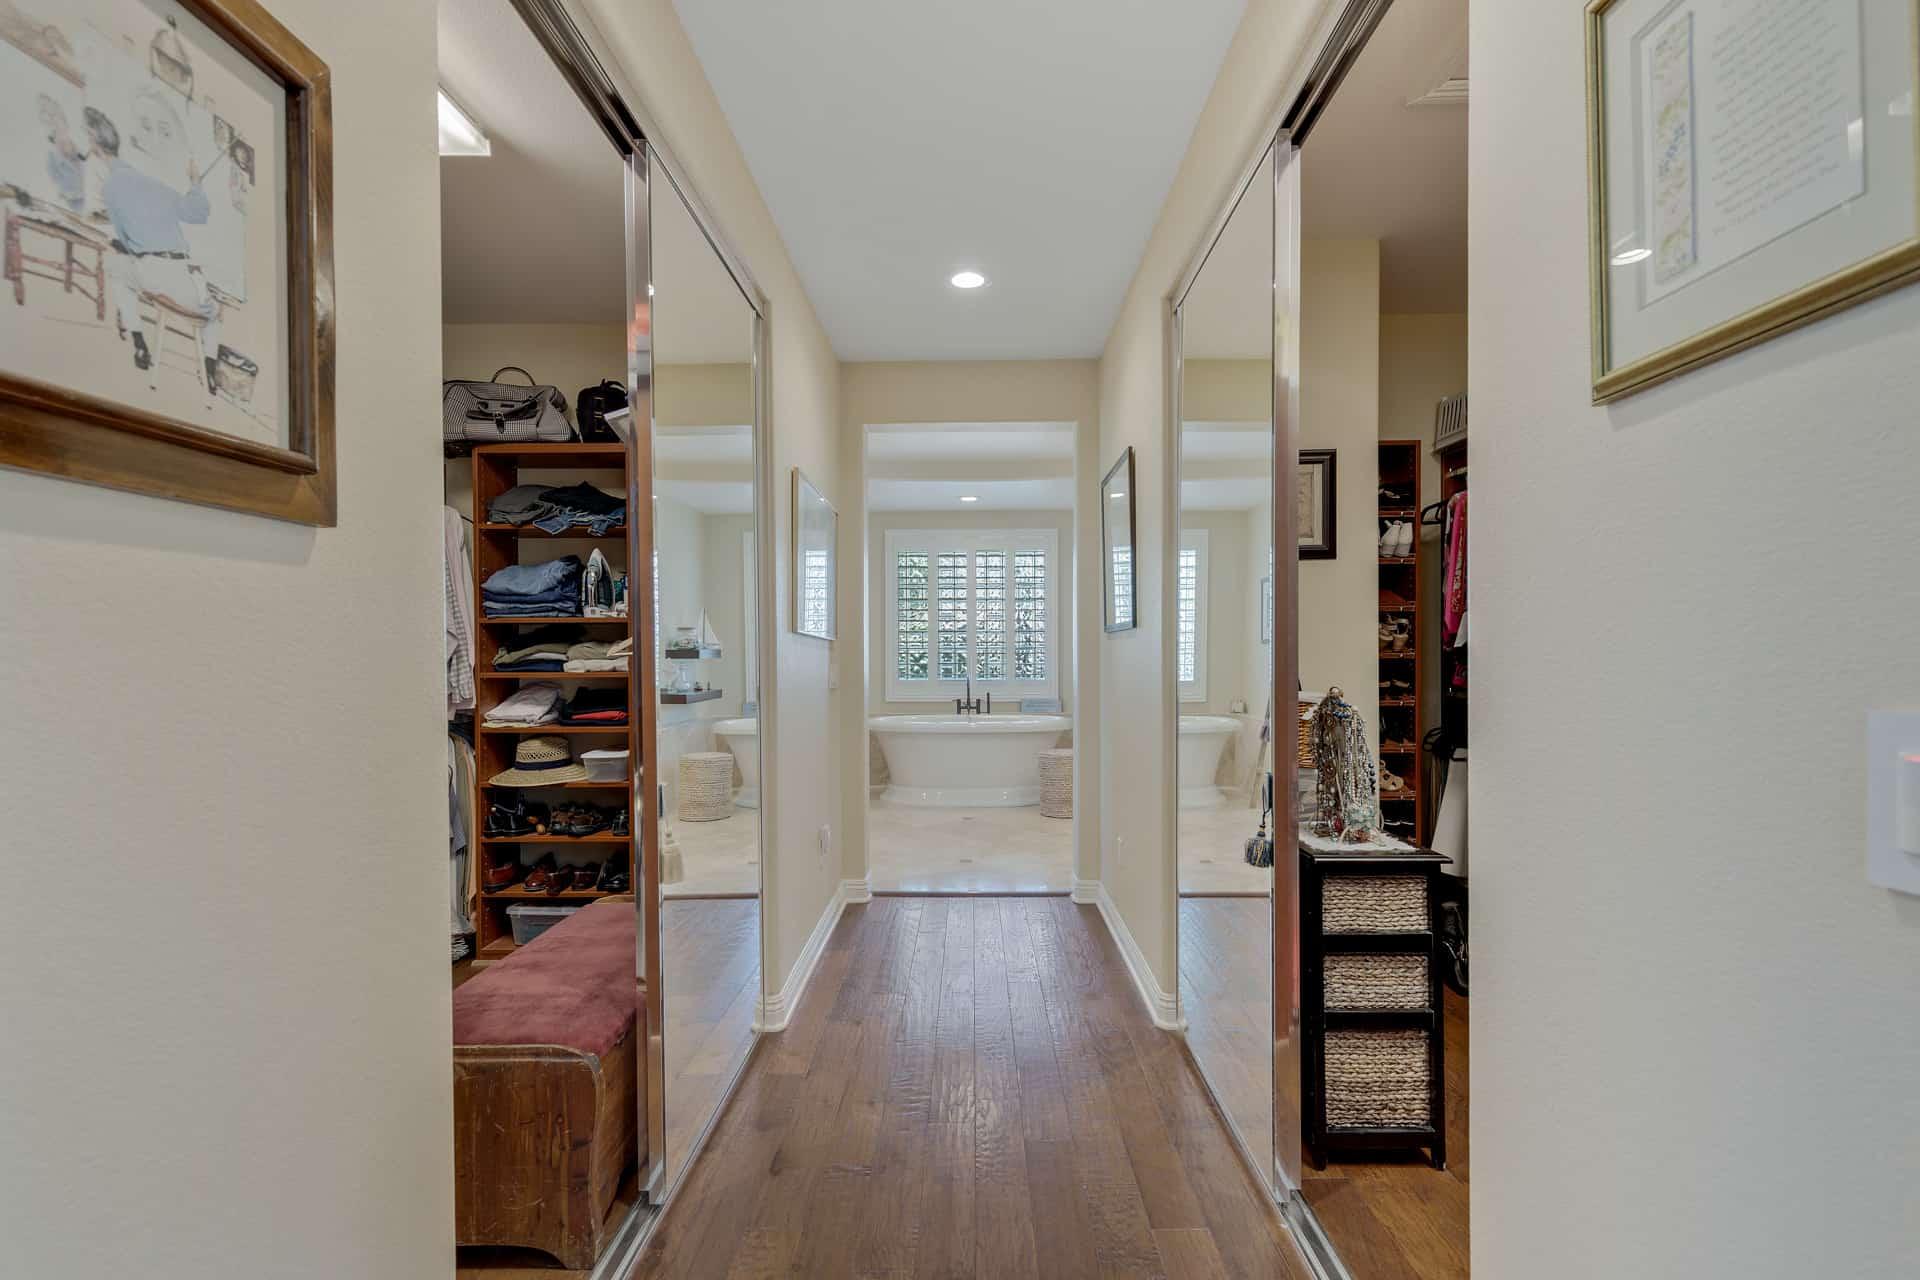 las-vegas-luxry-real-estate-realtor-rob-jensen-company-704-tandoori-the-paseos59